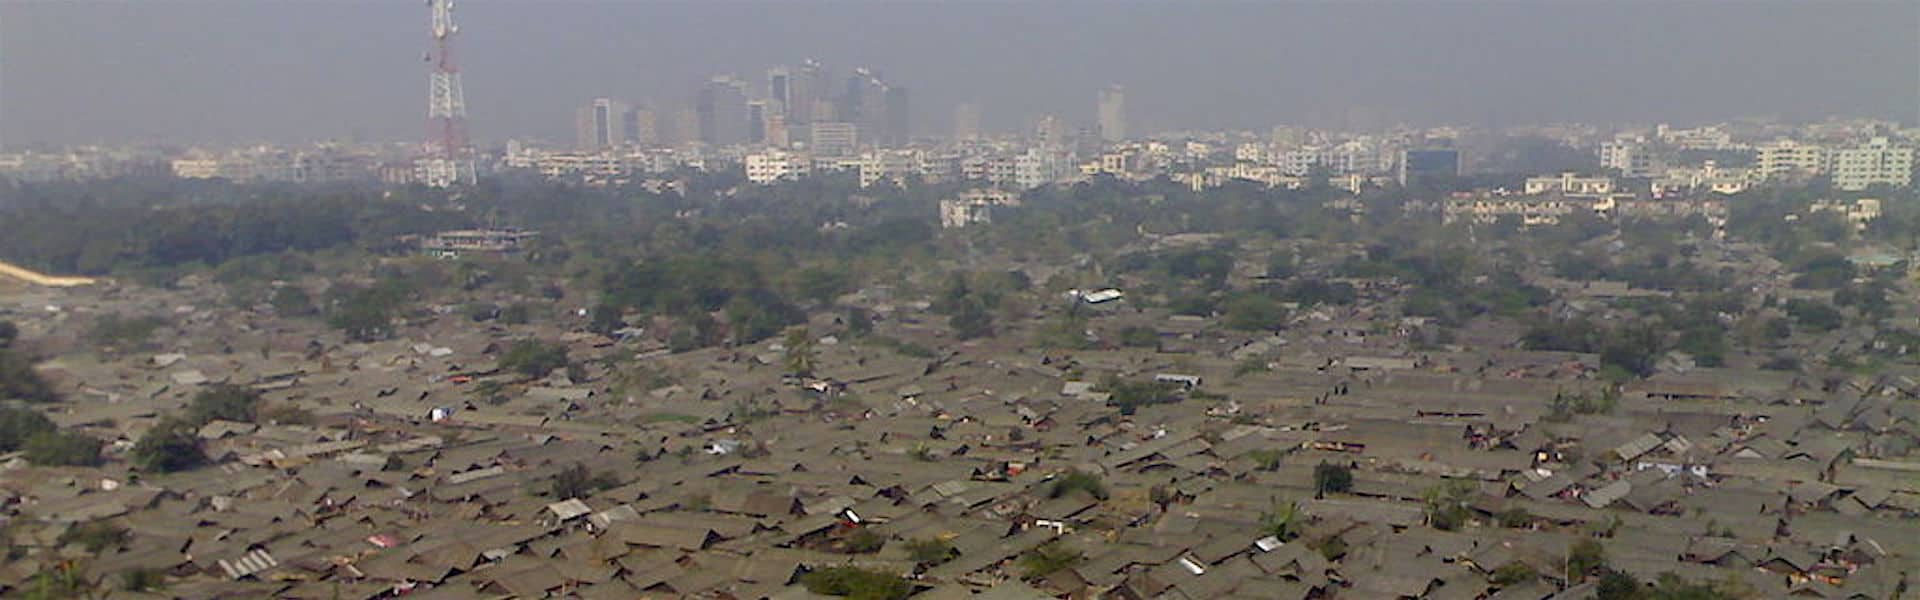 Reimagining Slums: Innovative Solutions to Bangladesh's Urban Housing Dilemma